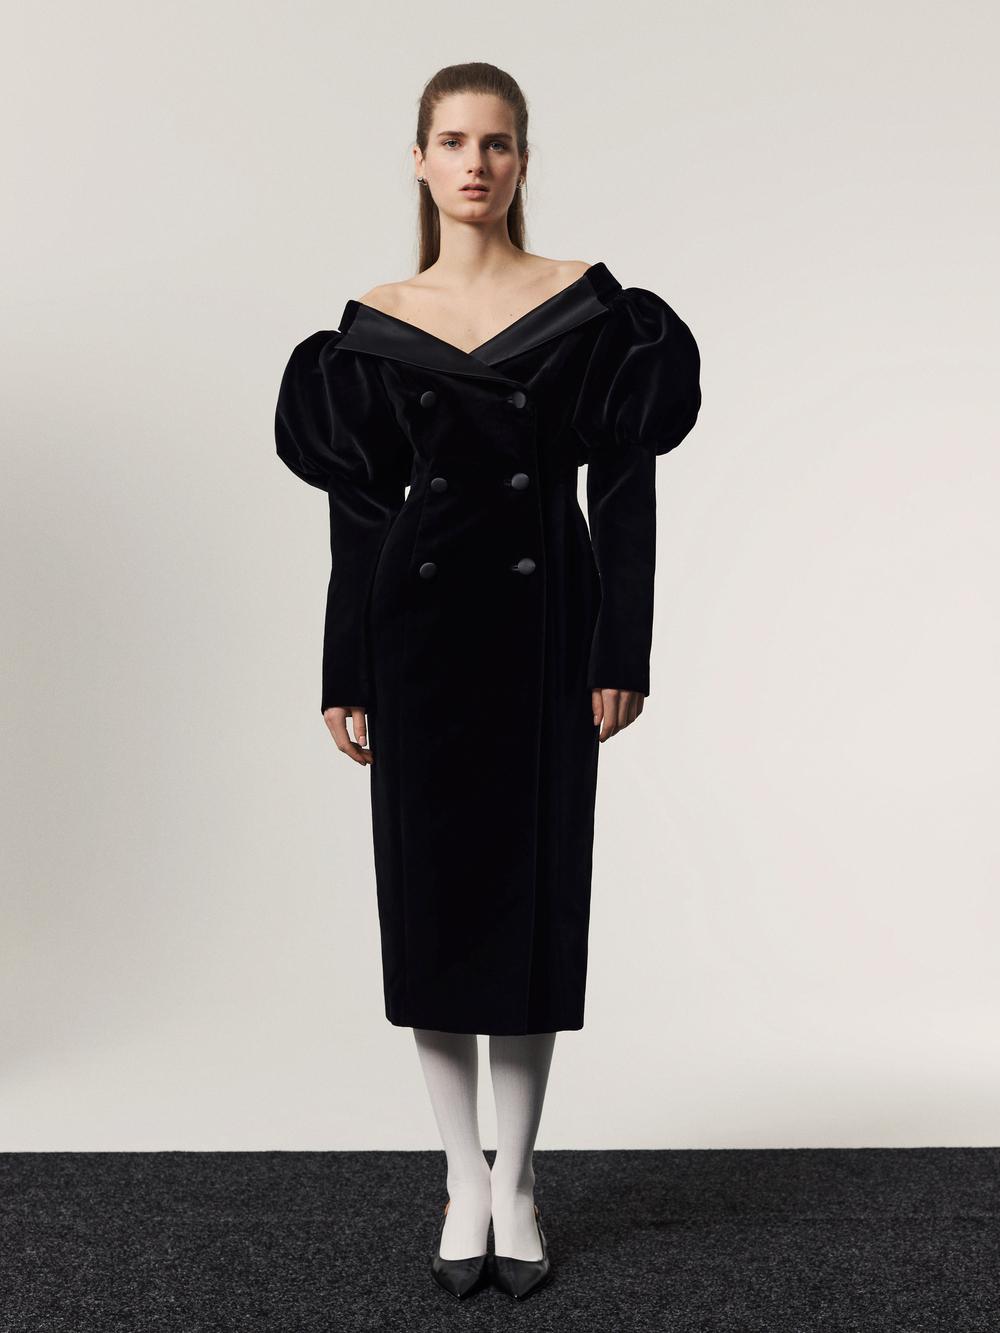 В стиле Жаклин Кеннеди: Украинский бренд Marianna Senchina презентовал коллекцию Fall-Winter 21/22-Фото 1